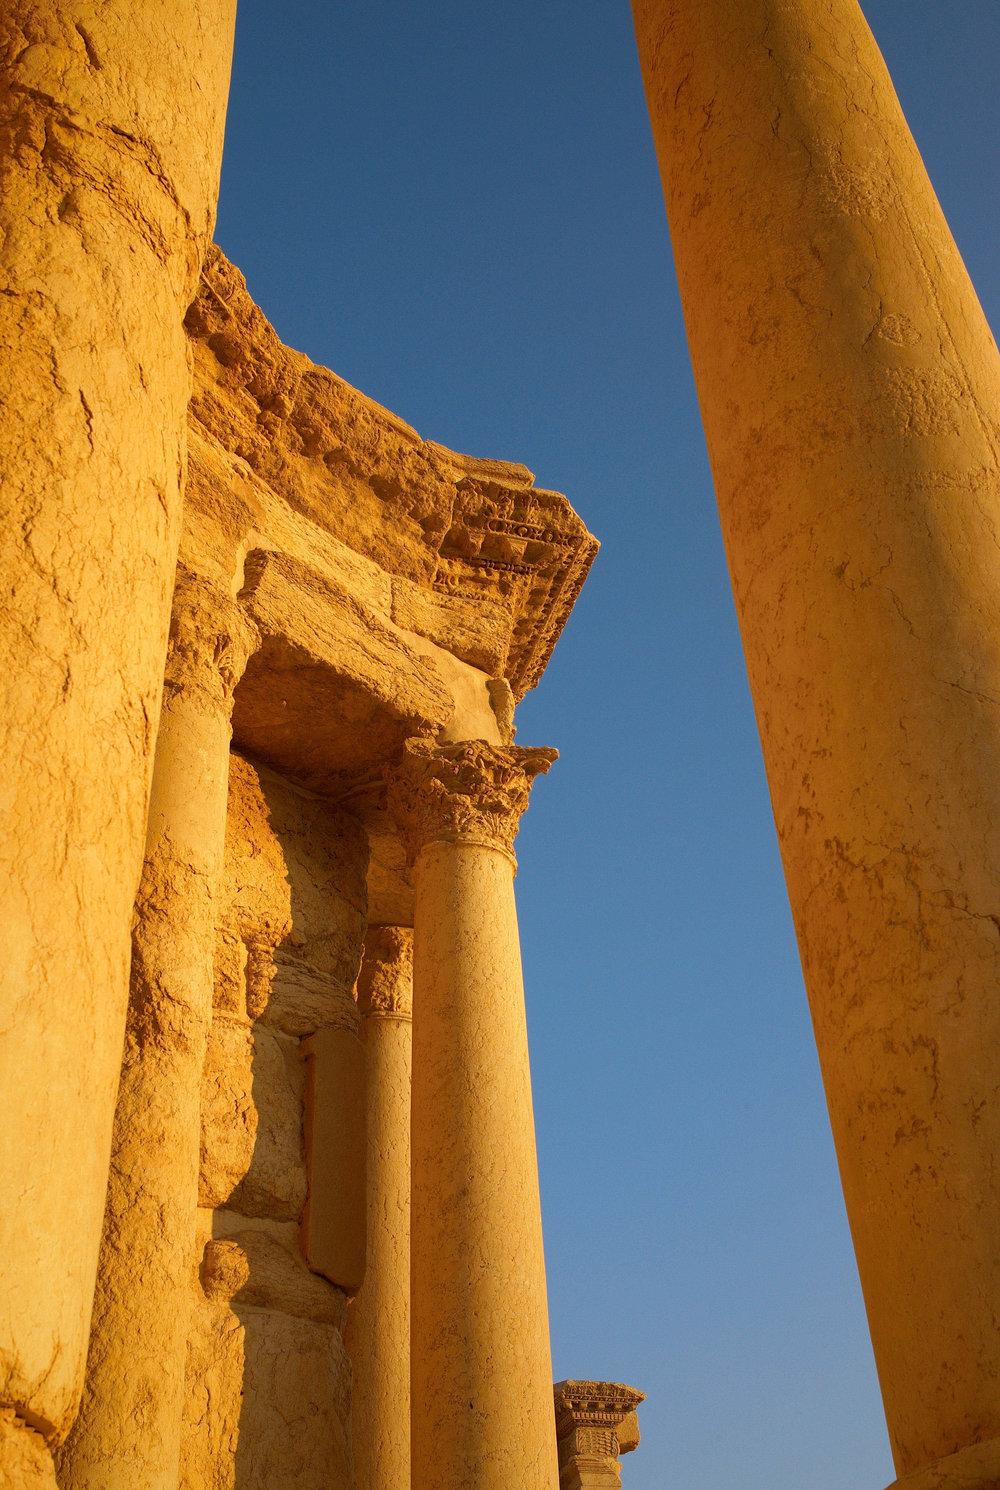 15 Syria 2009 Palmyra 5 (1 of 1).jpg